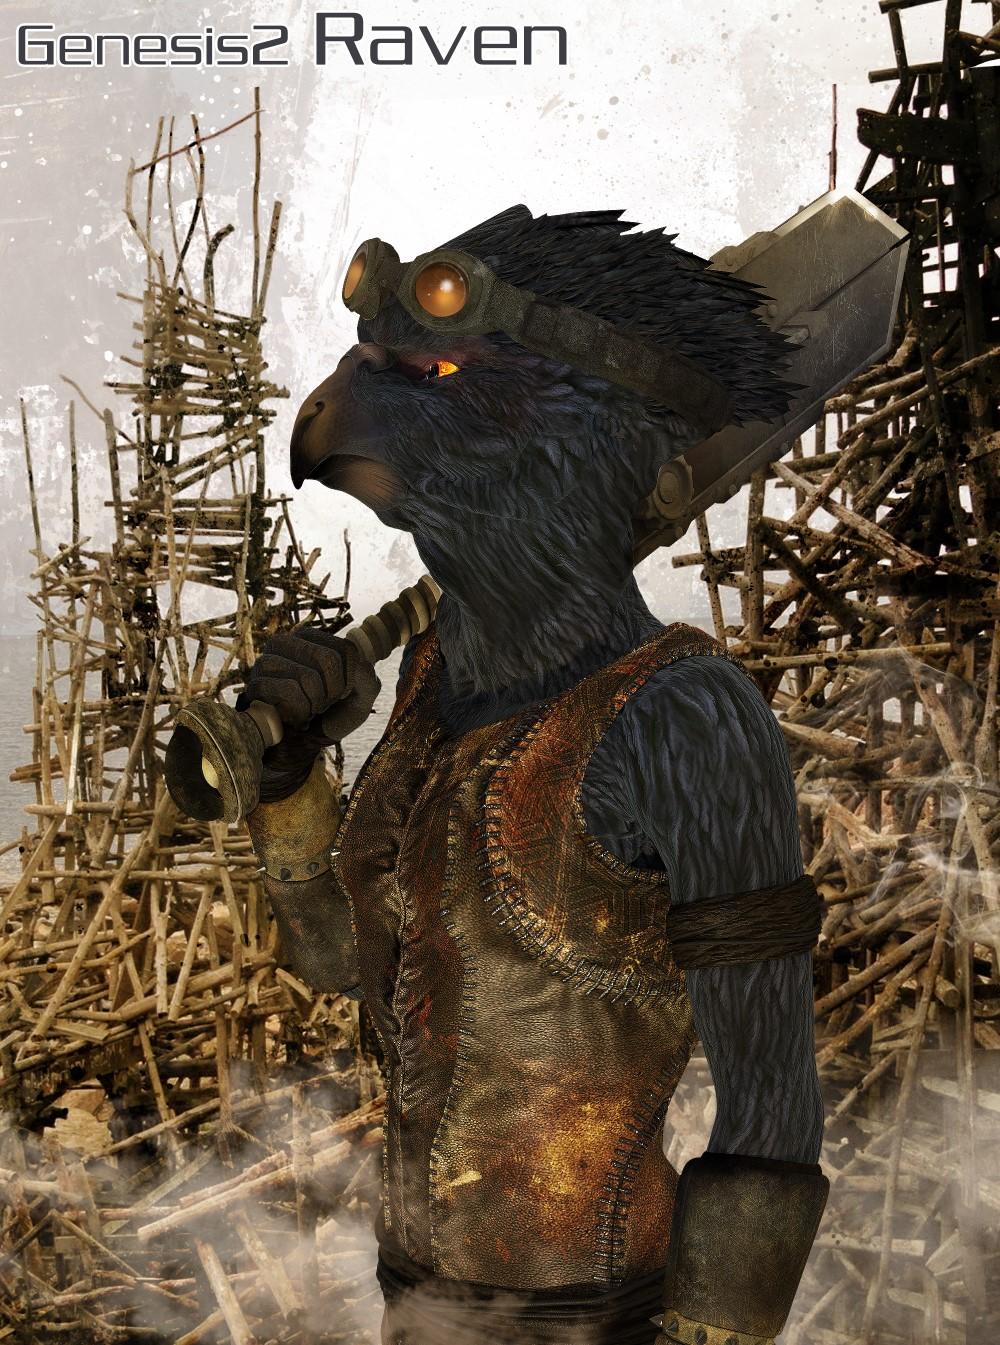 Genesis 2 Raven by: The AntFarm, 3D Models by Daz 3D